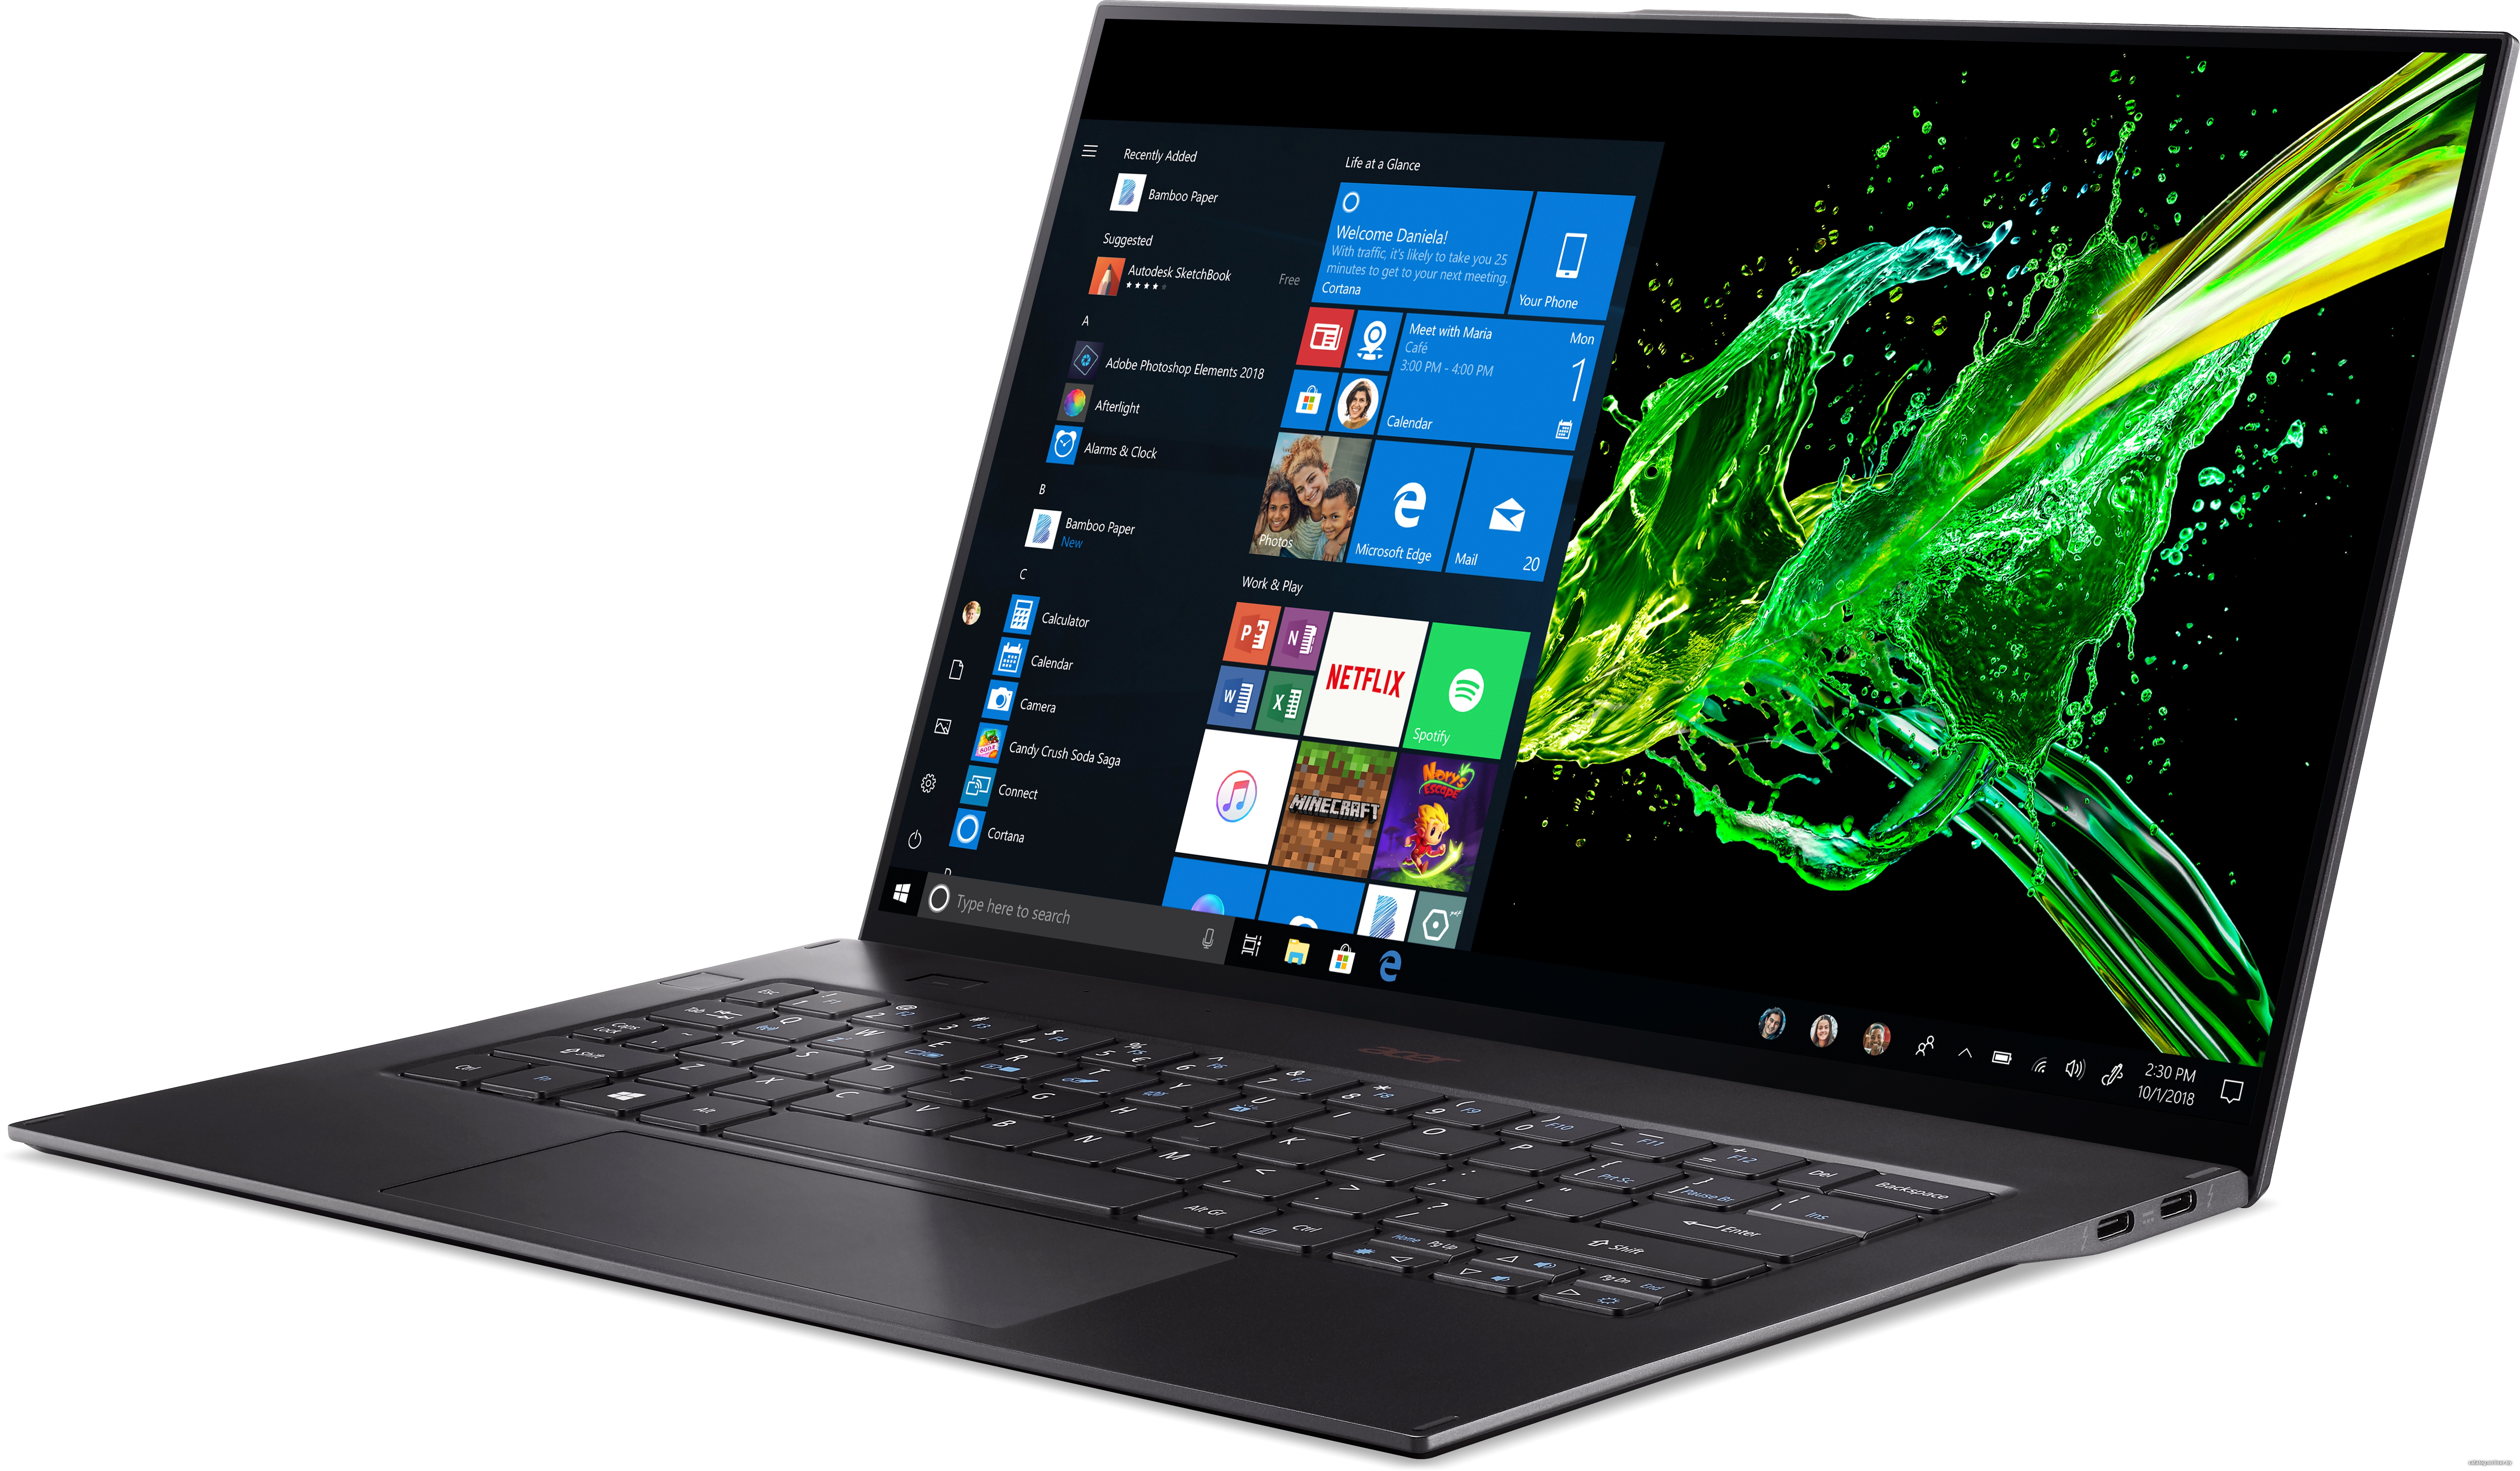 Acer Swift 7 SF714-52T-72EV NX.HB4EP.005 Image #4